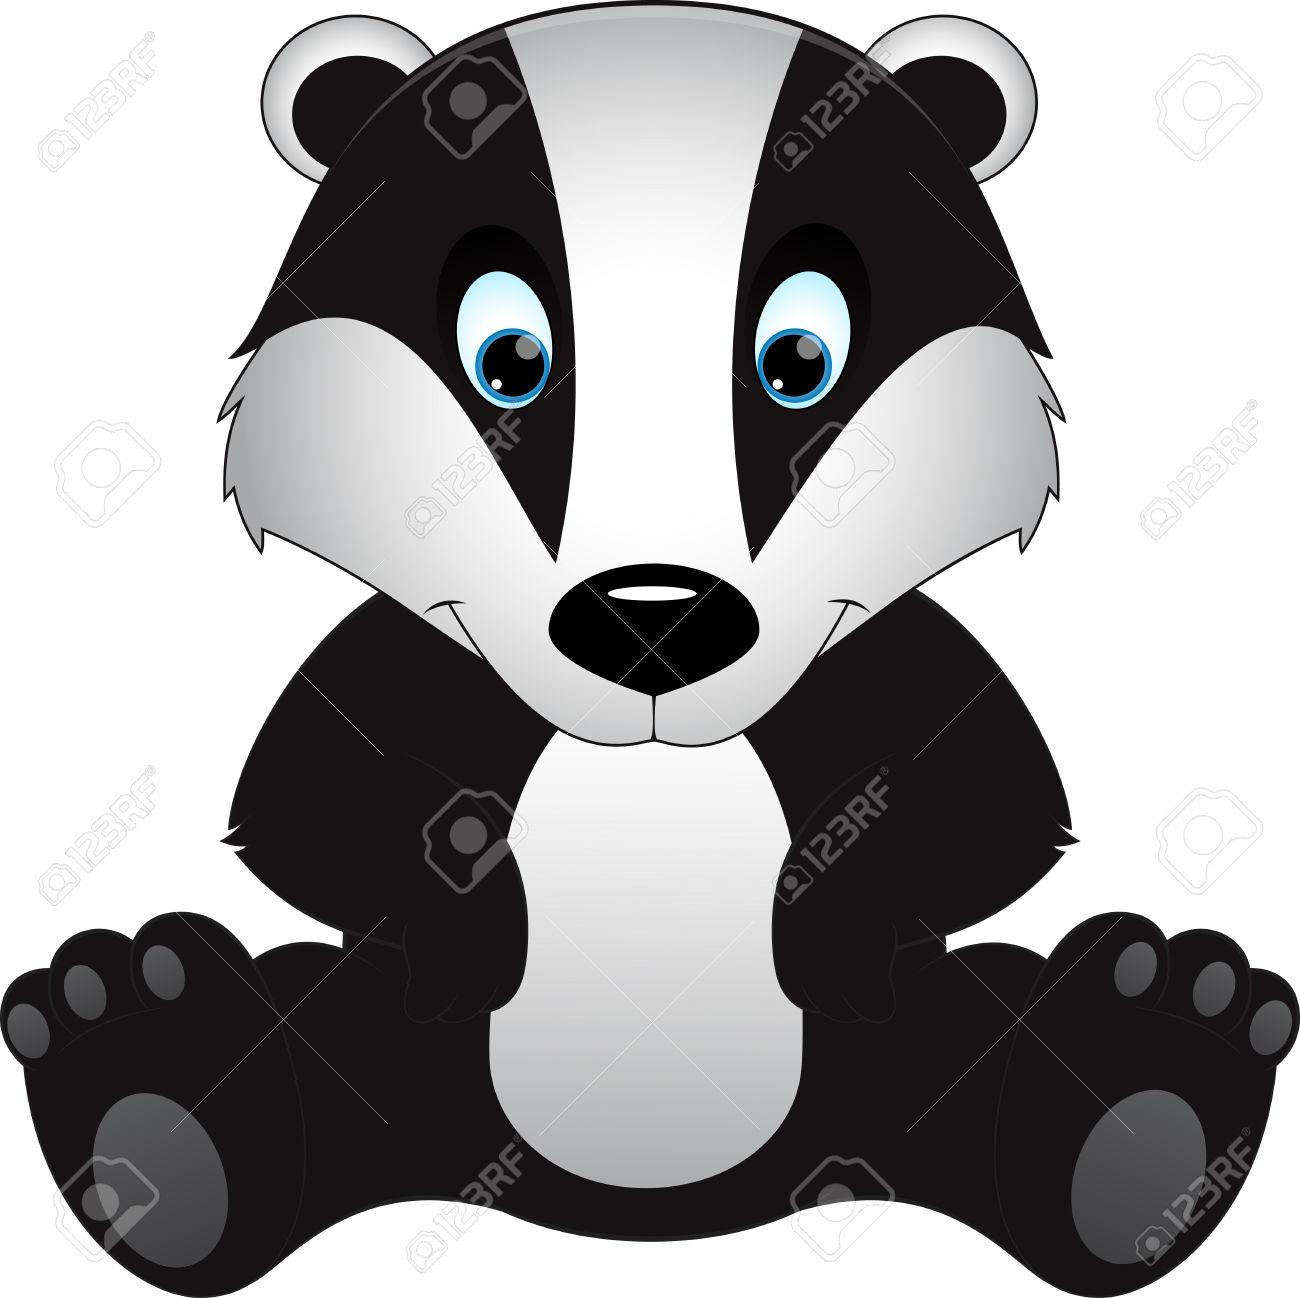 Image result for badger clipart